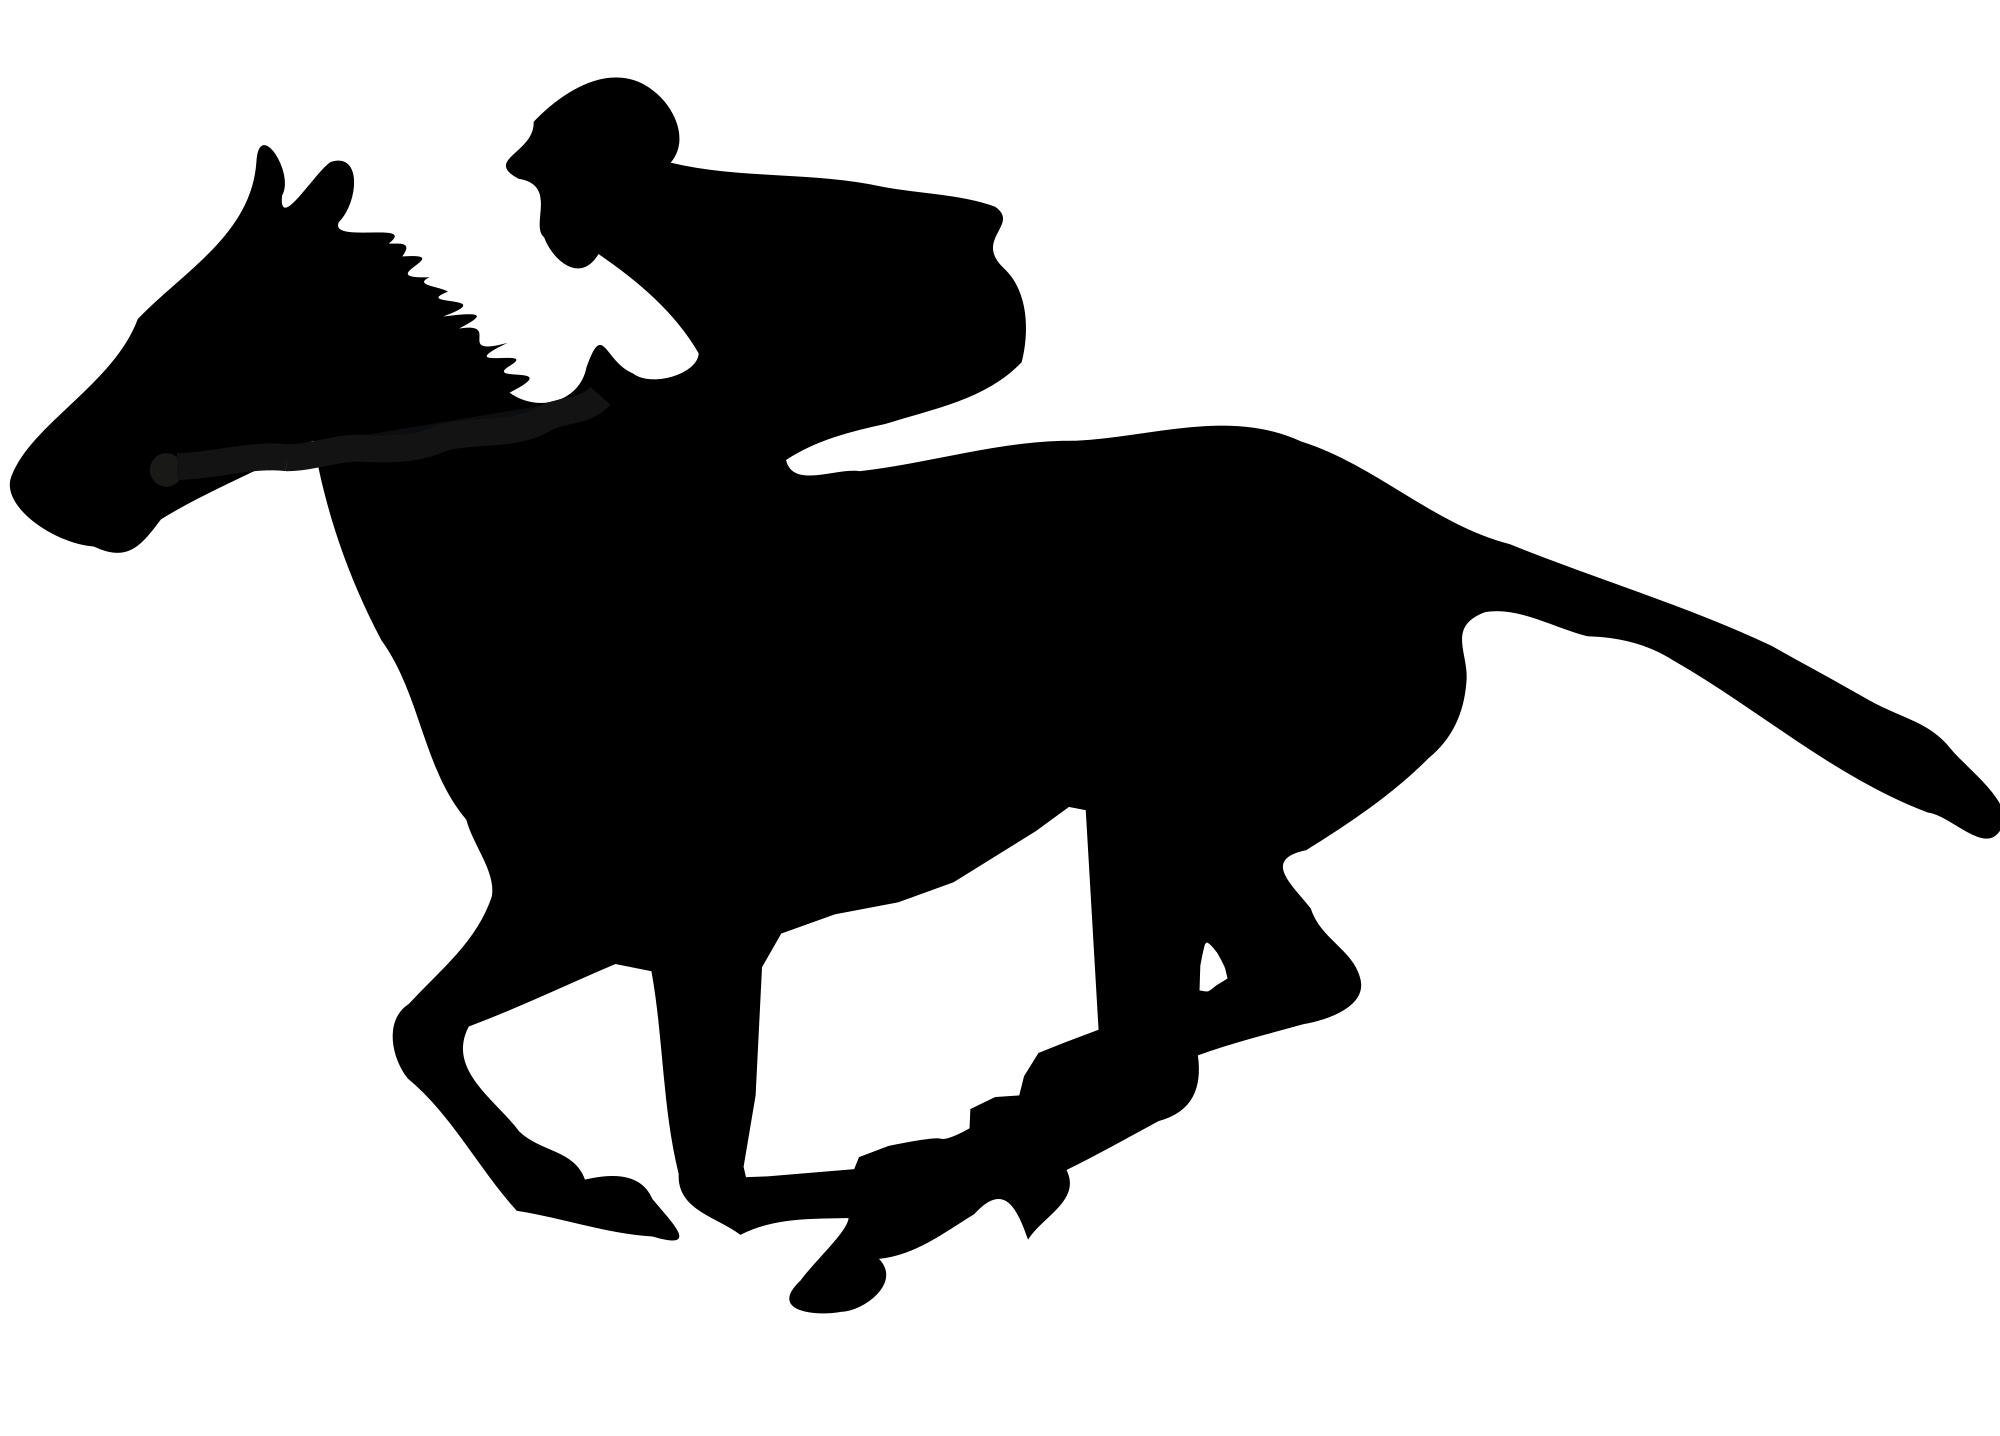 2000x1436 Fileflat Racing Clipart.svg